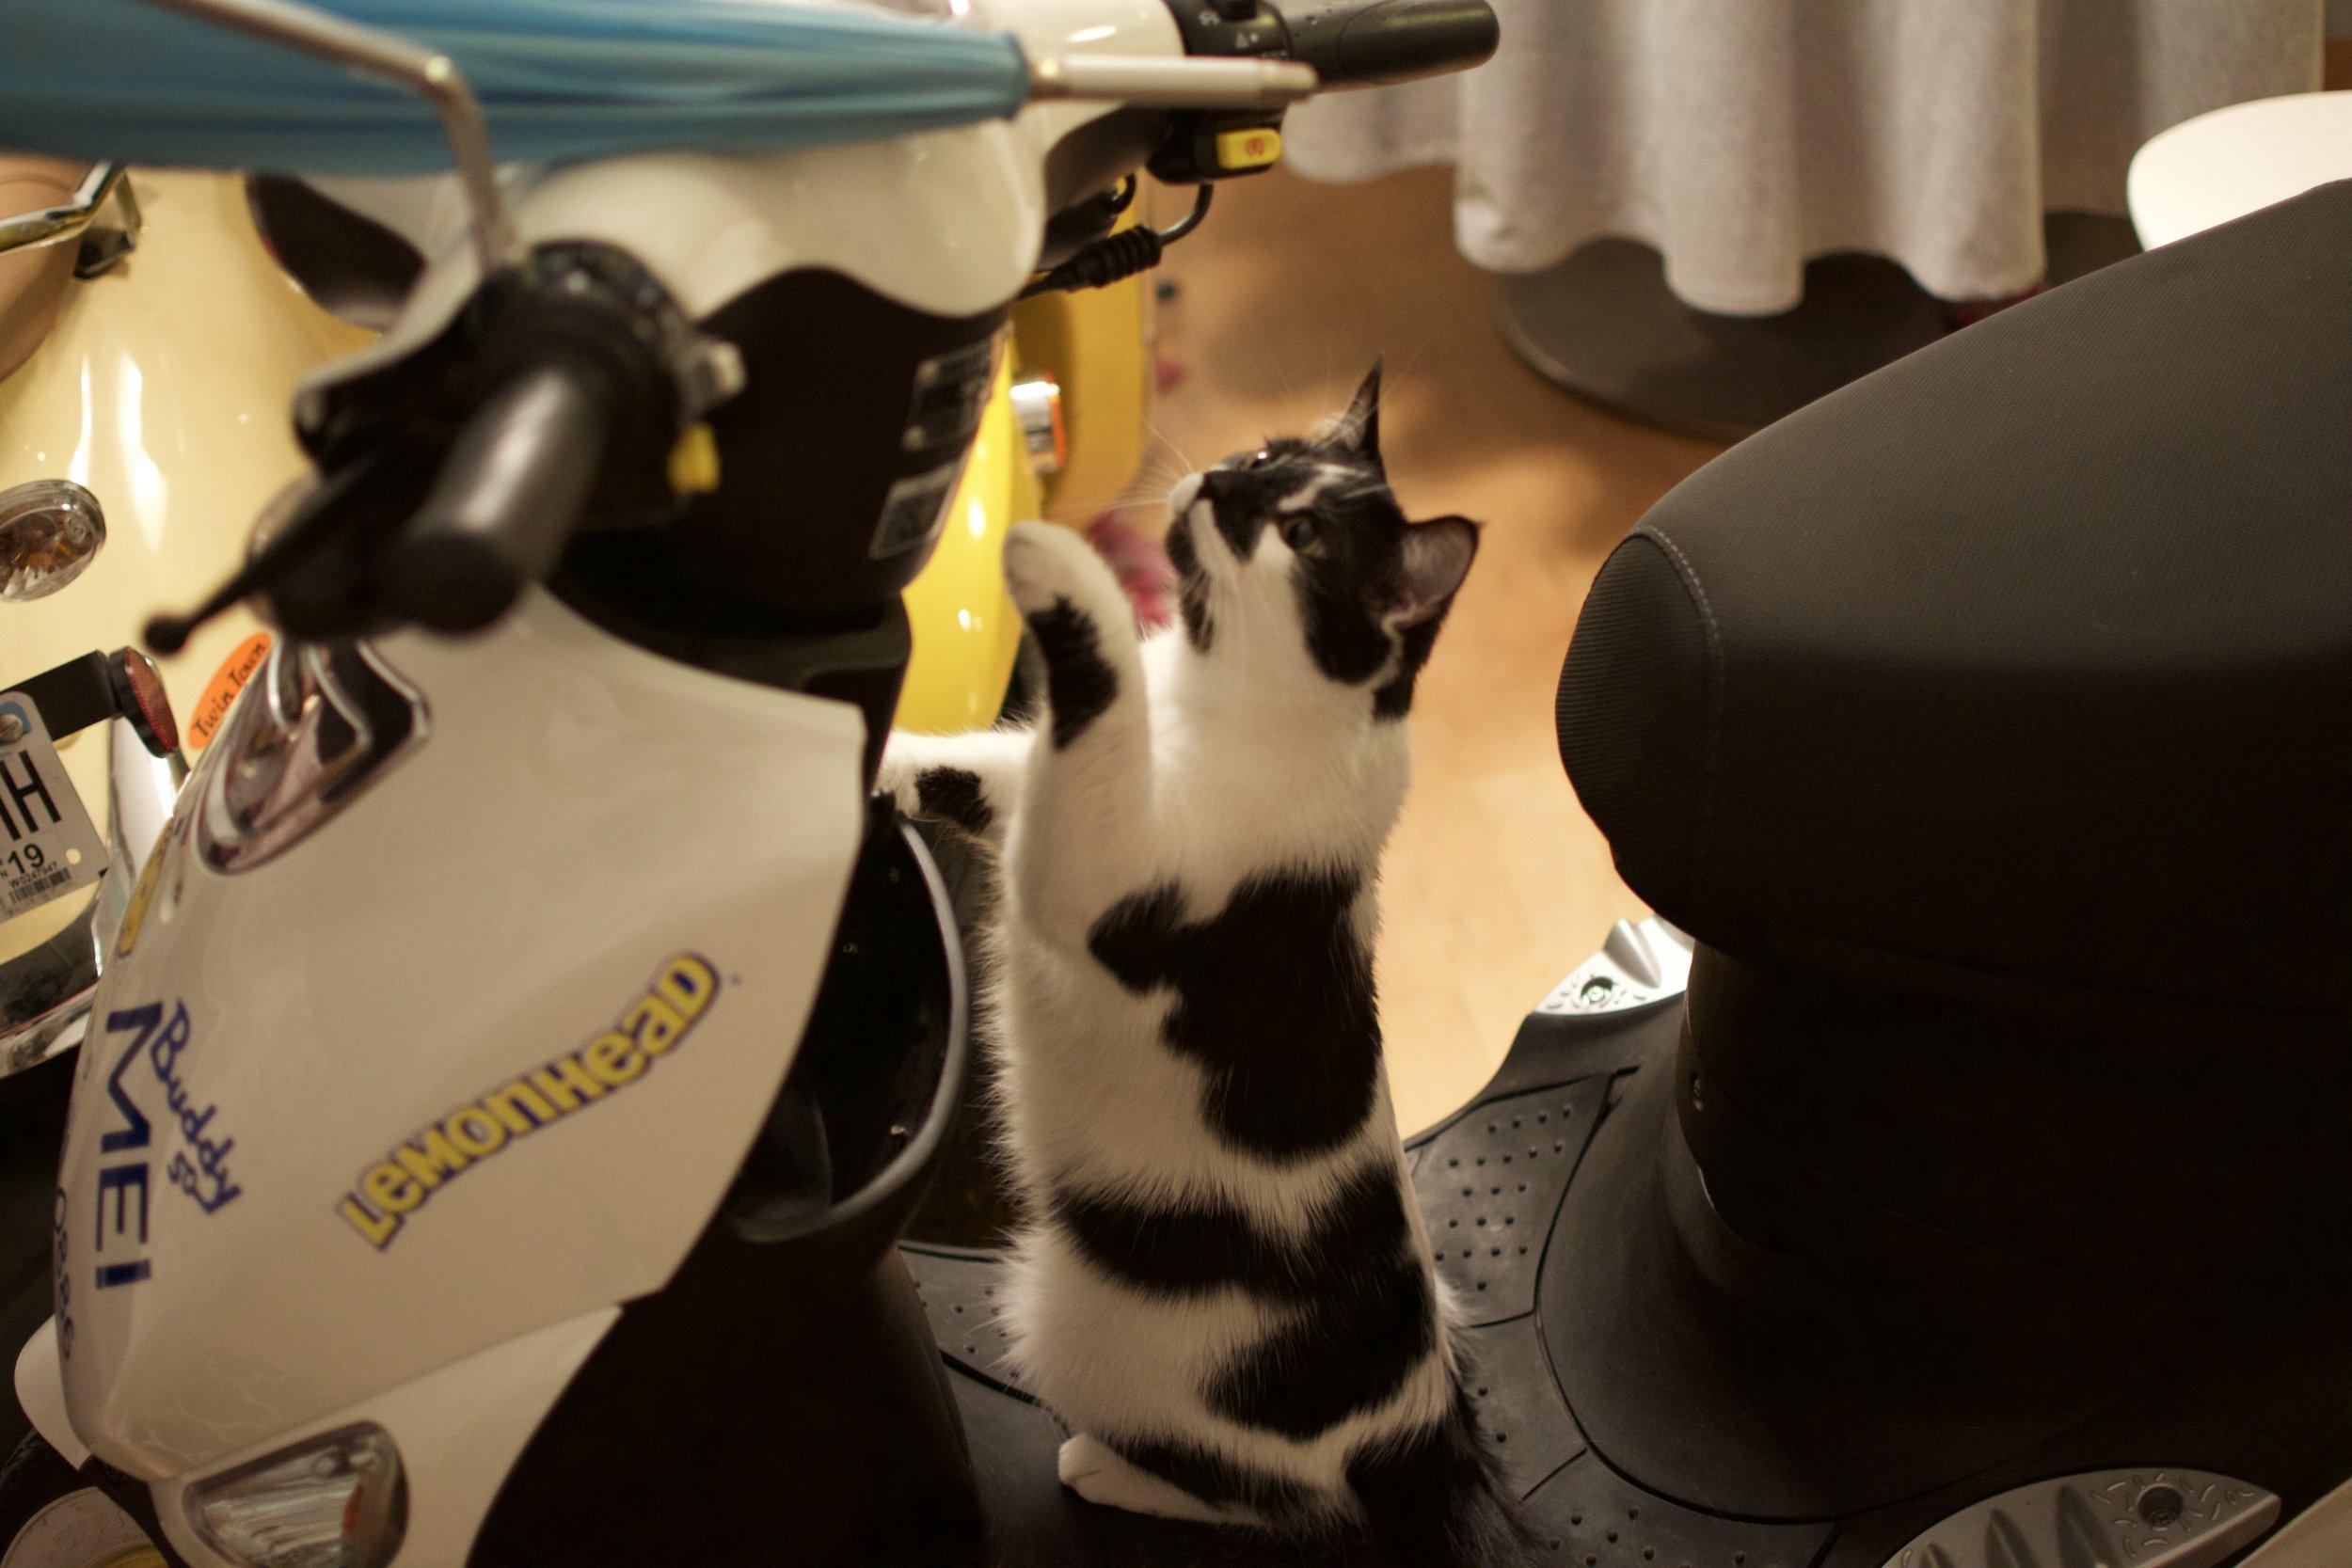 Broski  (he thinks he's a mechanic..he's not)